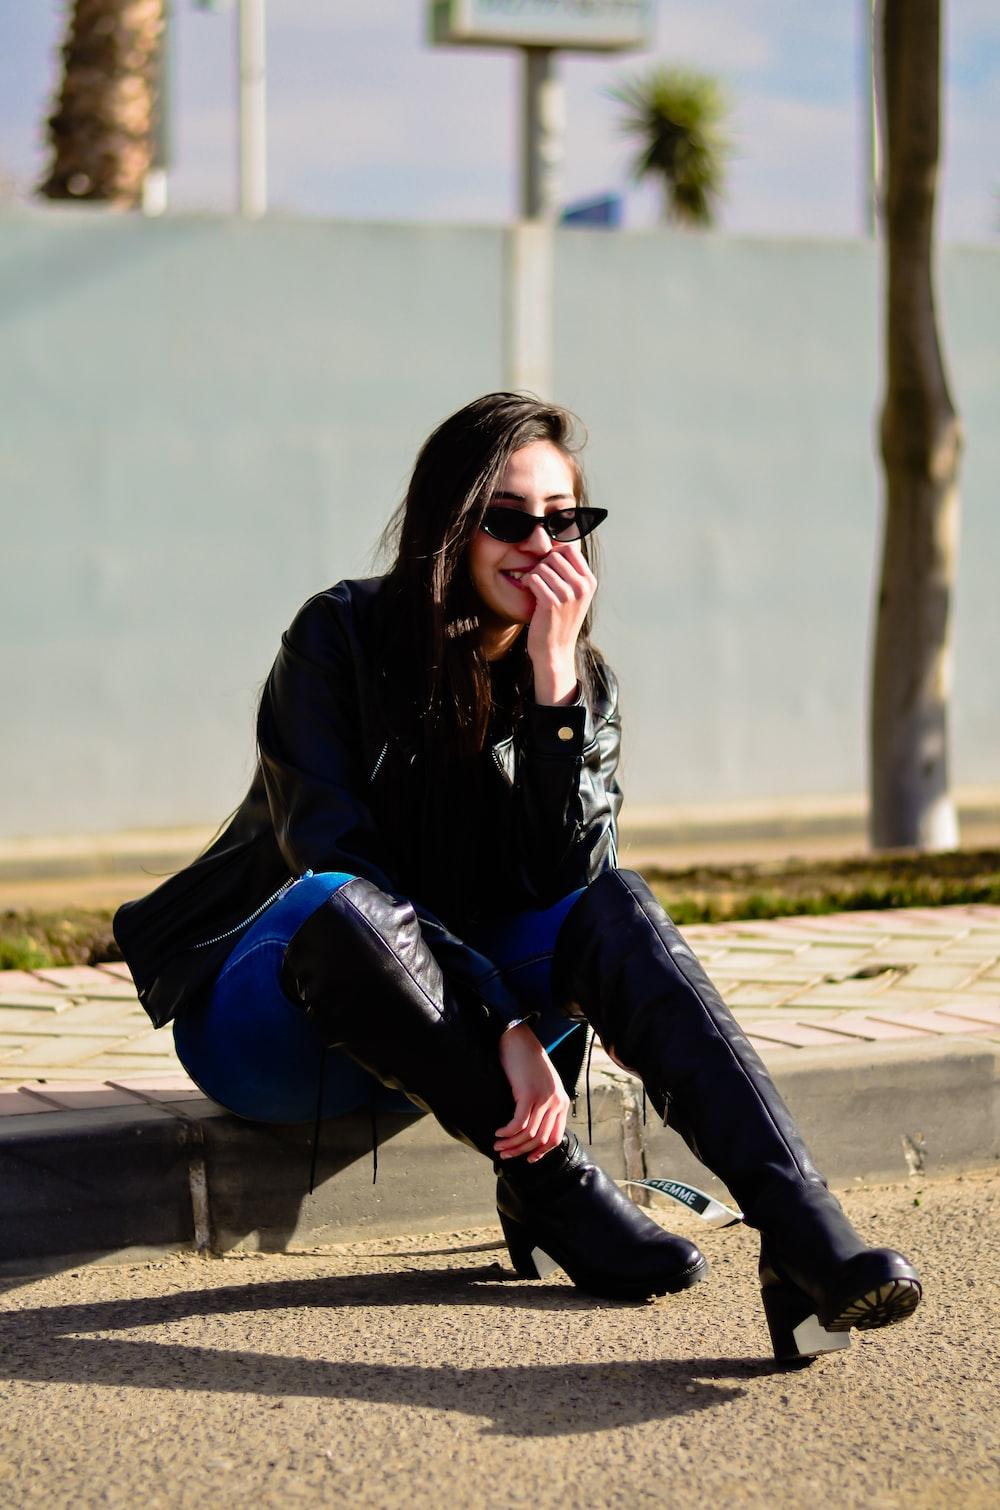 smiling woman sitting on pavement